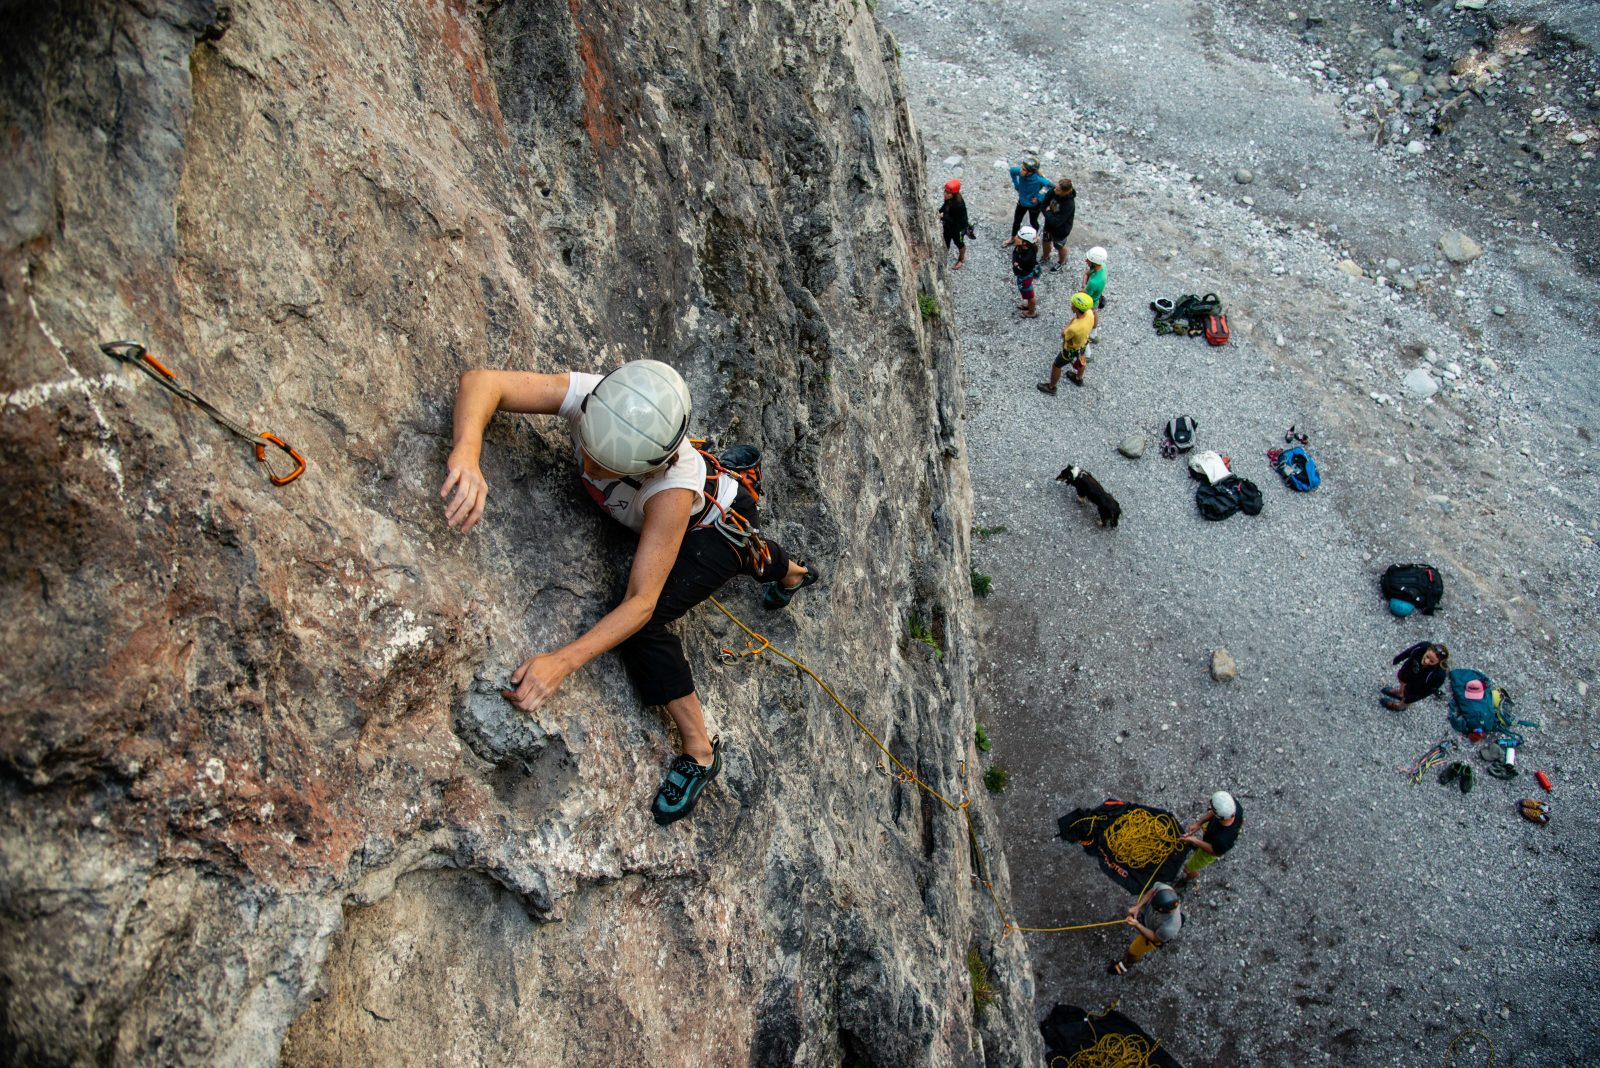 Klettercamps von SAAC, Foto: SAAC | Climbers Paradise